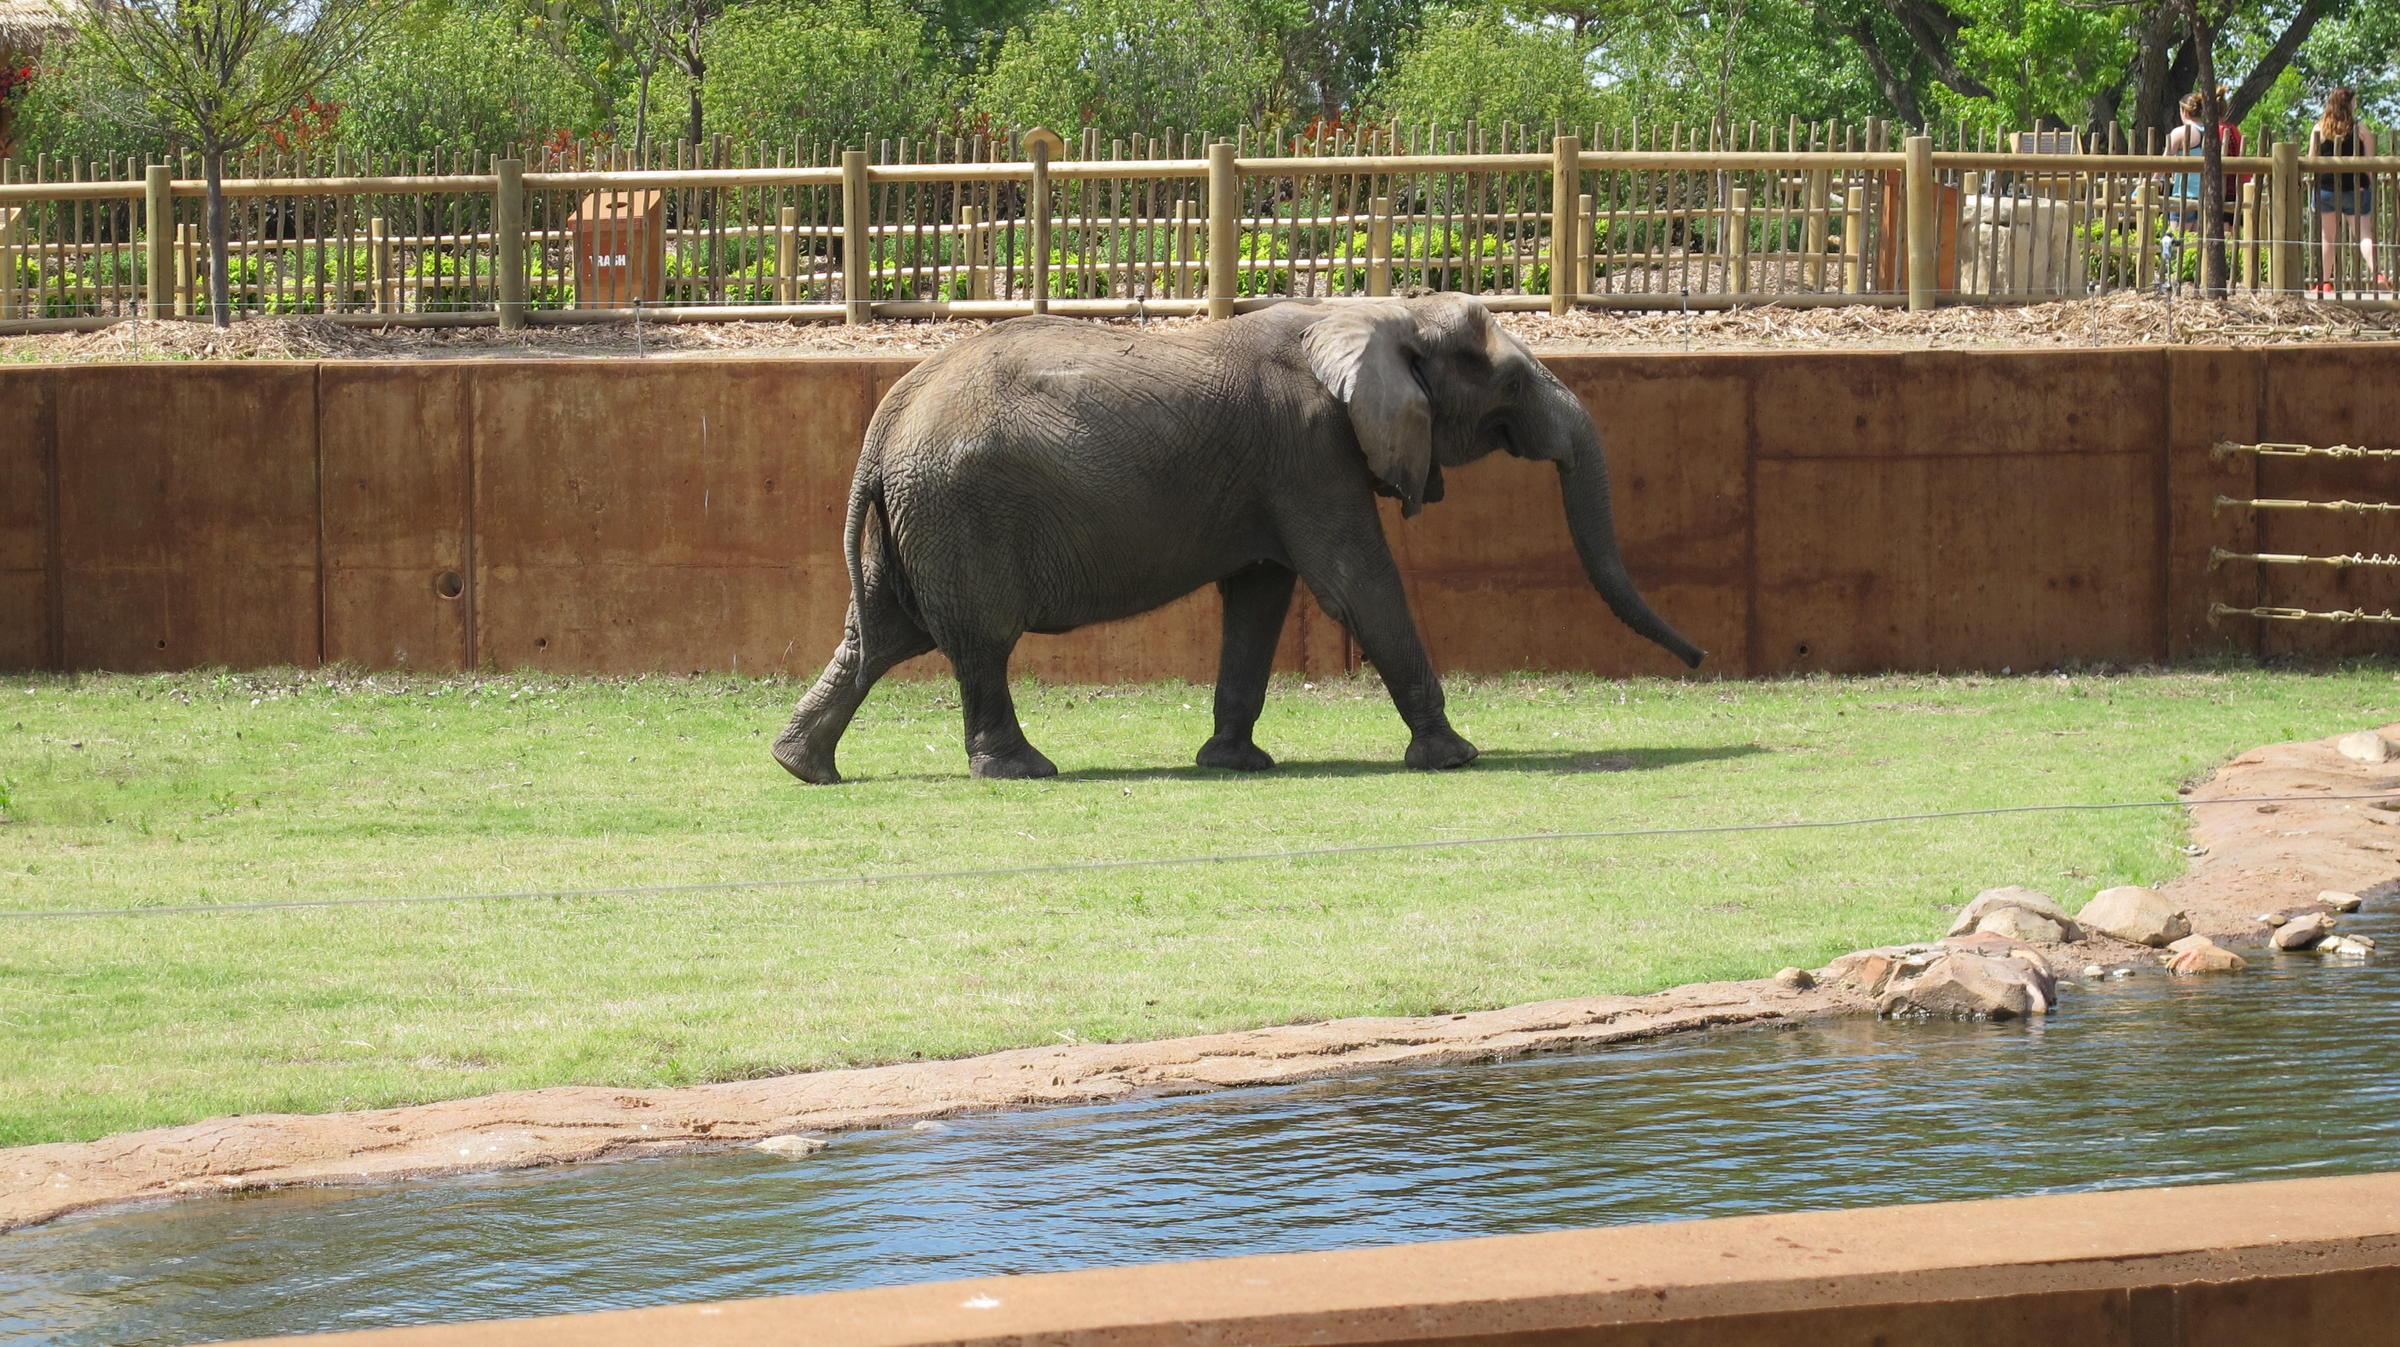 new elephant exhibit opens at sedgwick co zoo kmuw. Black Bedroom Furniture Sets. Home Design Ideas